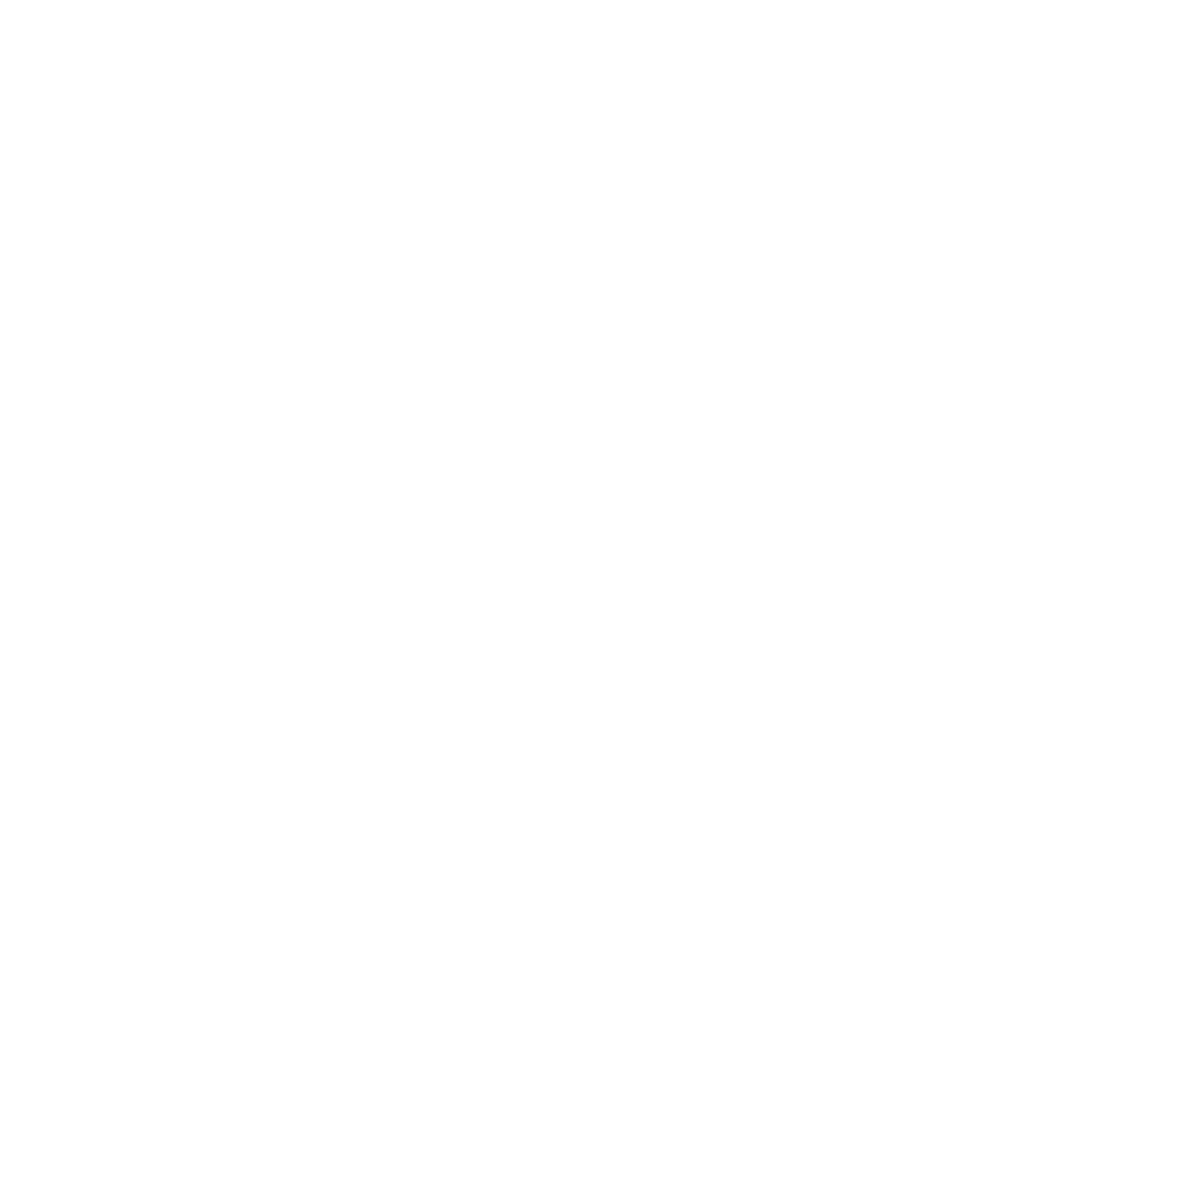 logo_rond_wit_Tekengebied 1 kopie 7